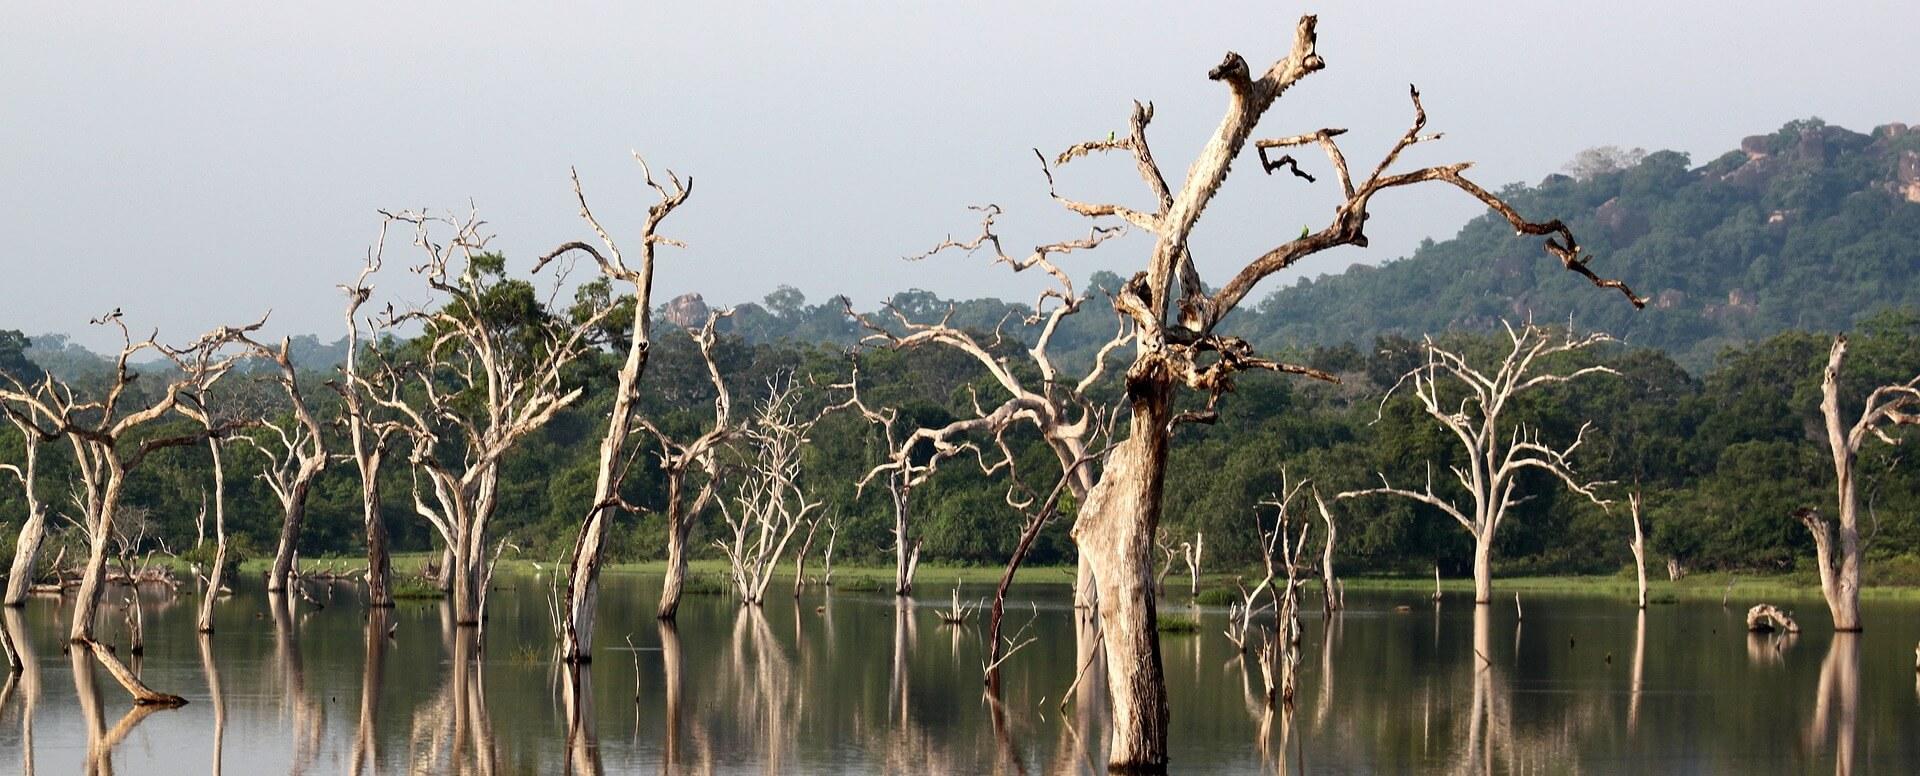 8. Taking advantage of national parks - Sri Lanka